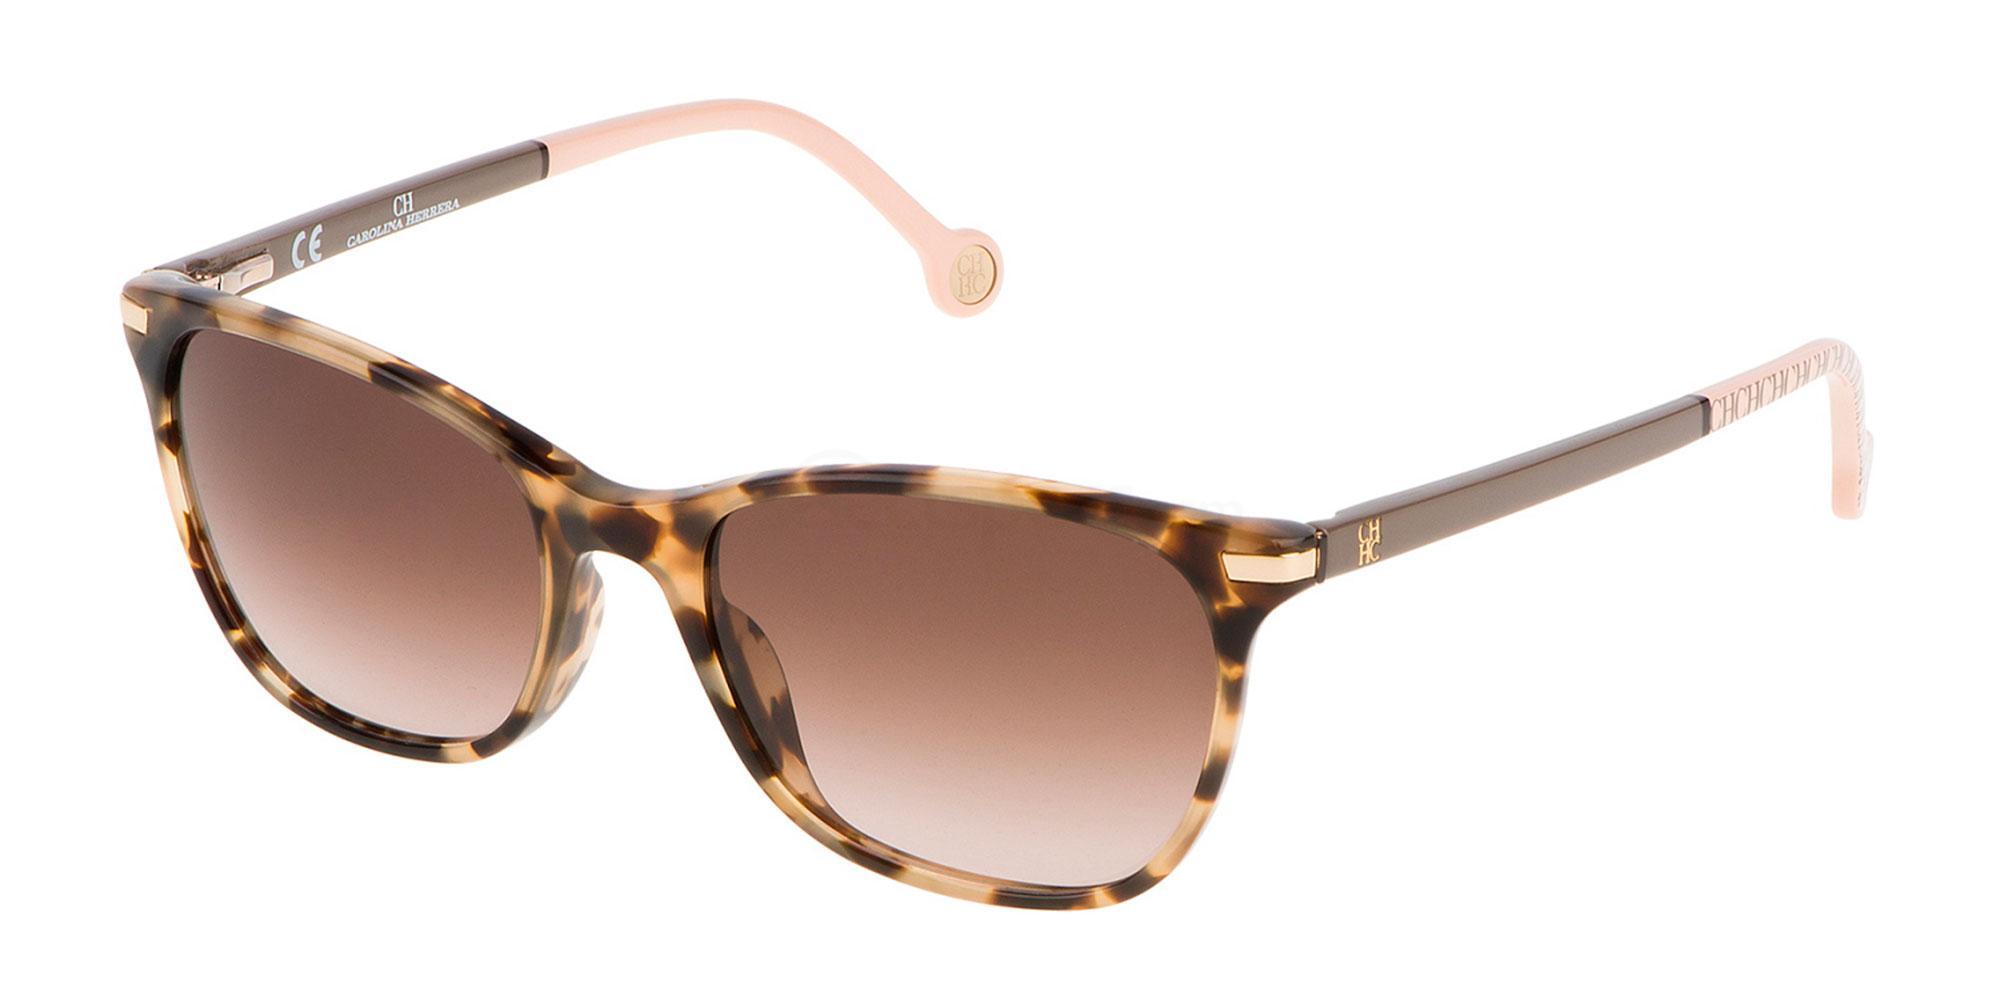 01GT SHE652 Sunglasses, CH Carolina Herrera